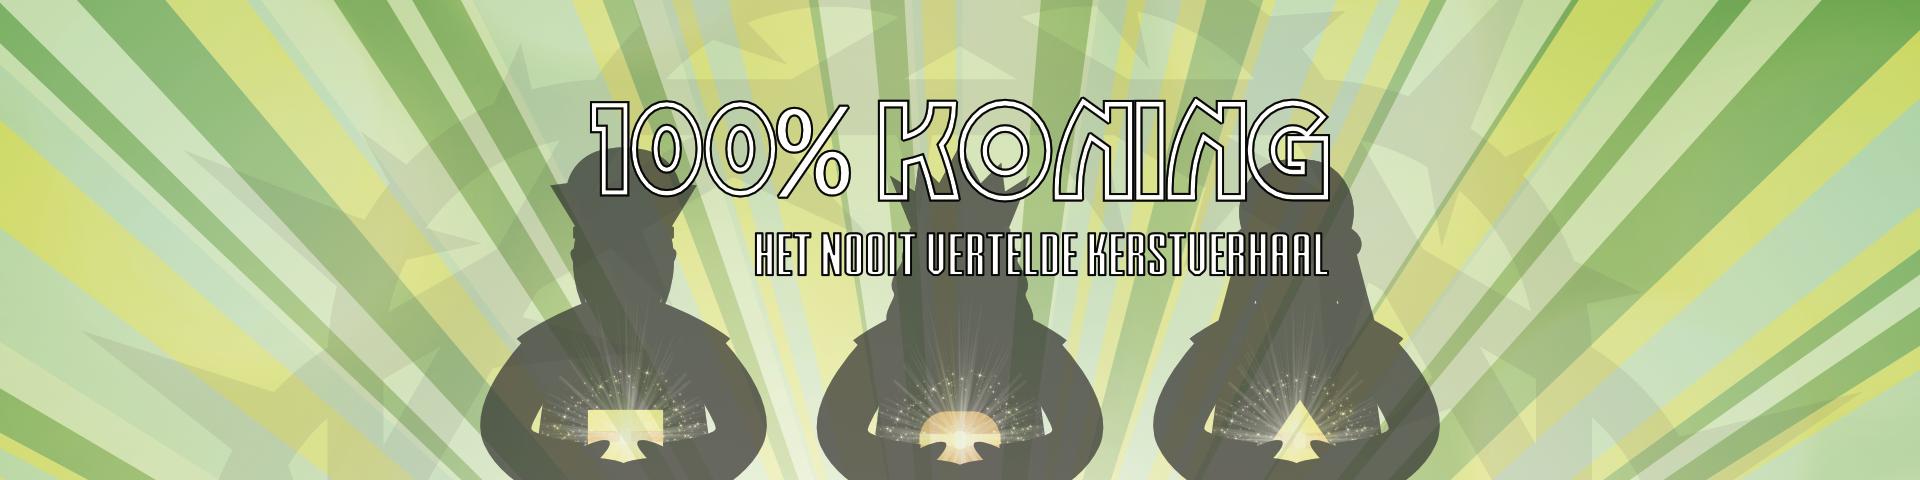 100% Koning Waarvan Acte Theaterproducties